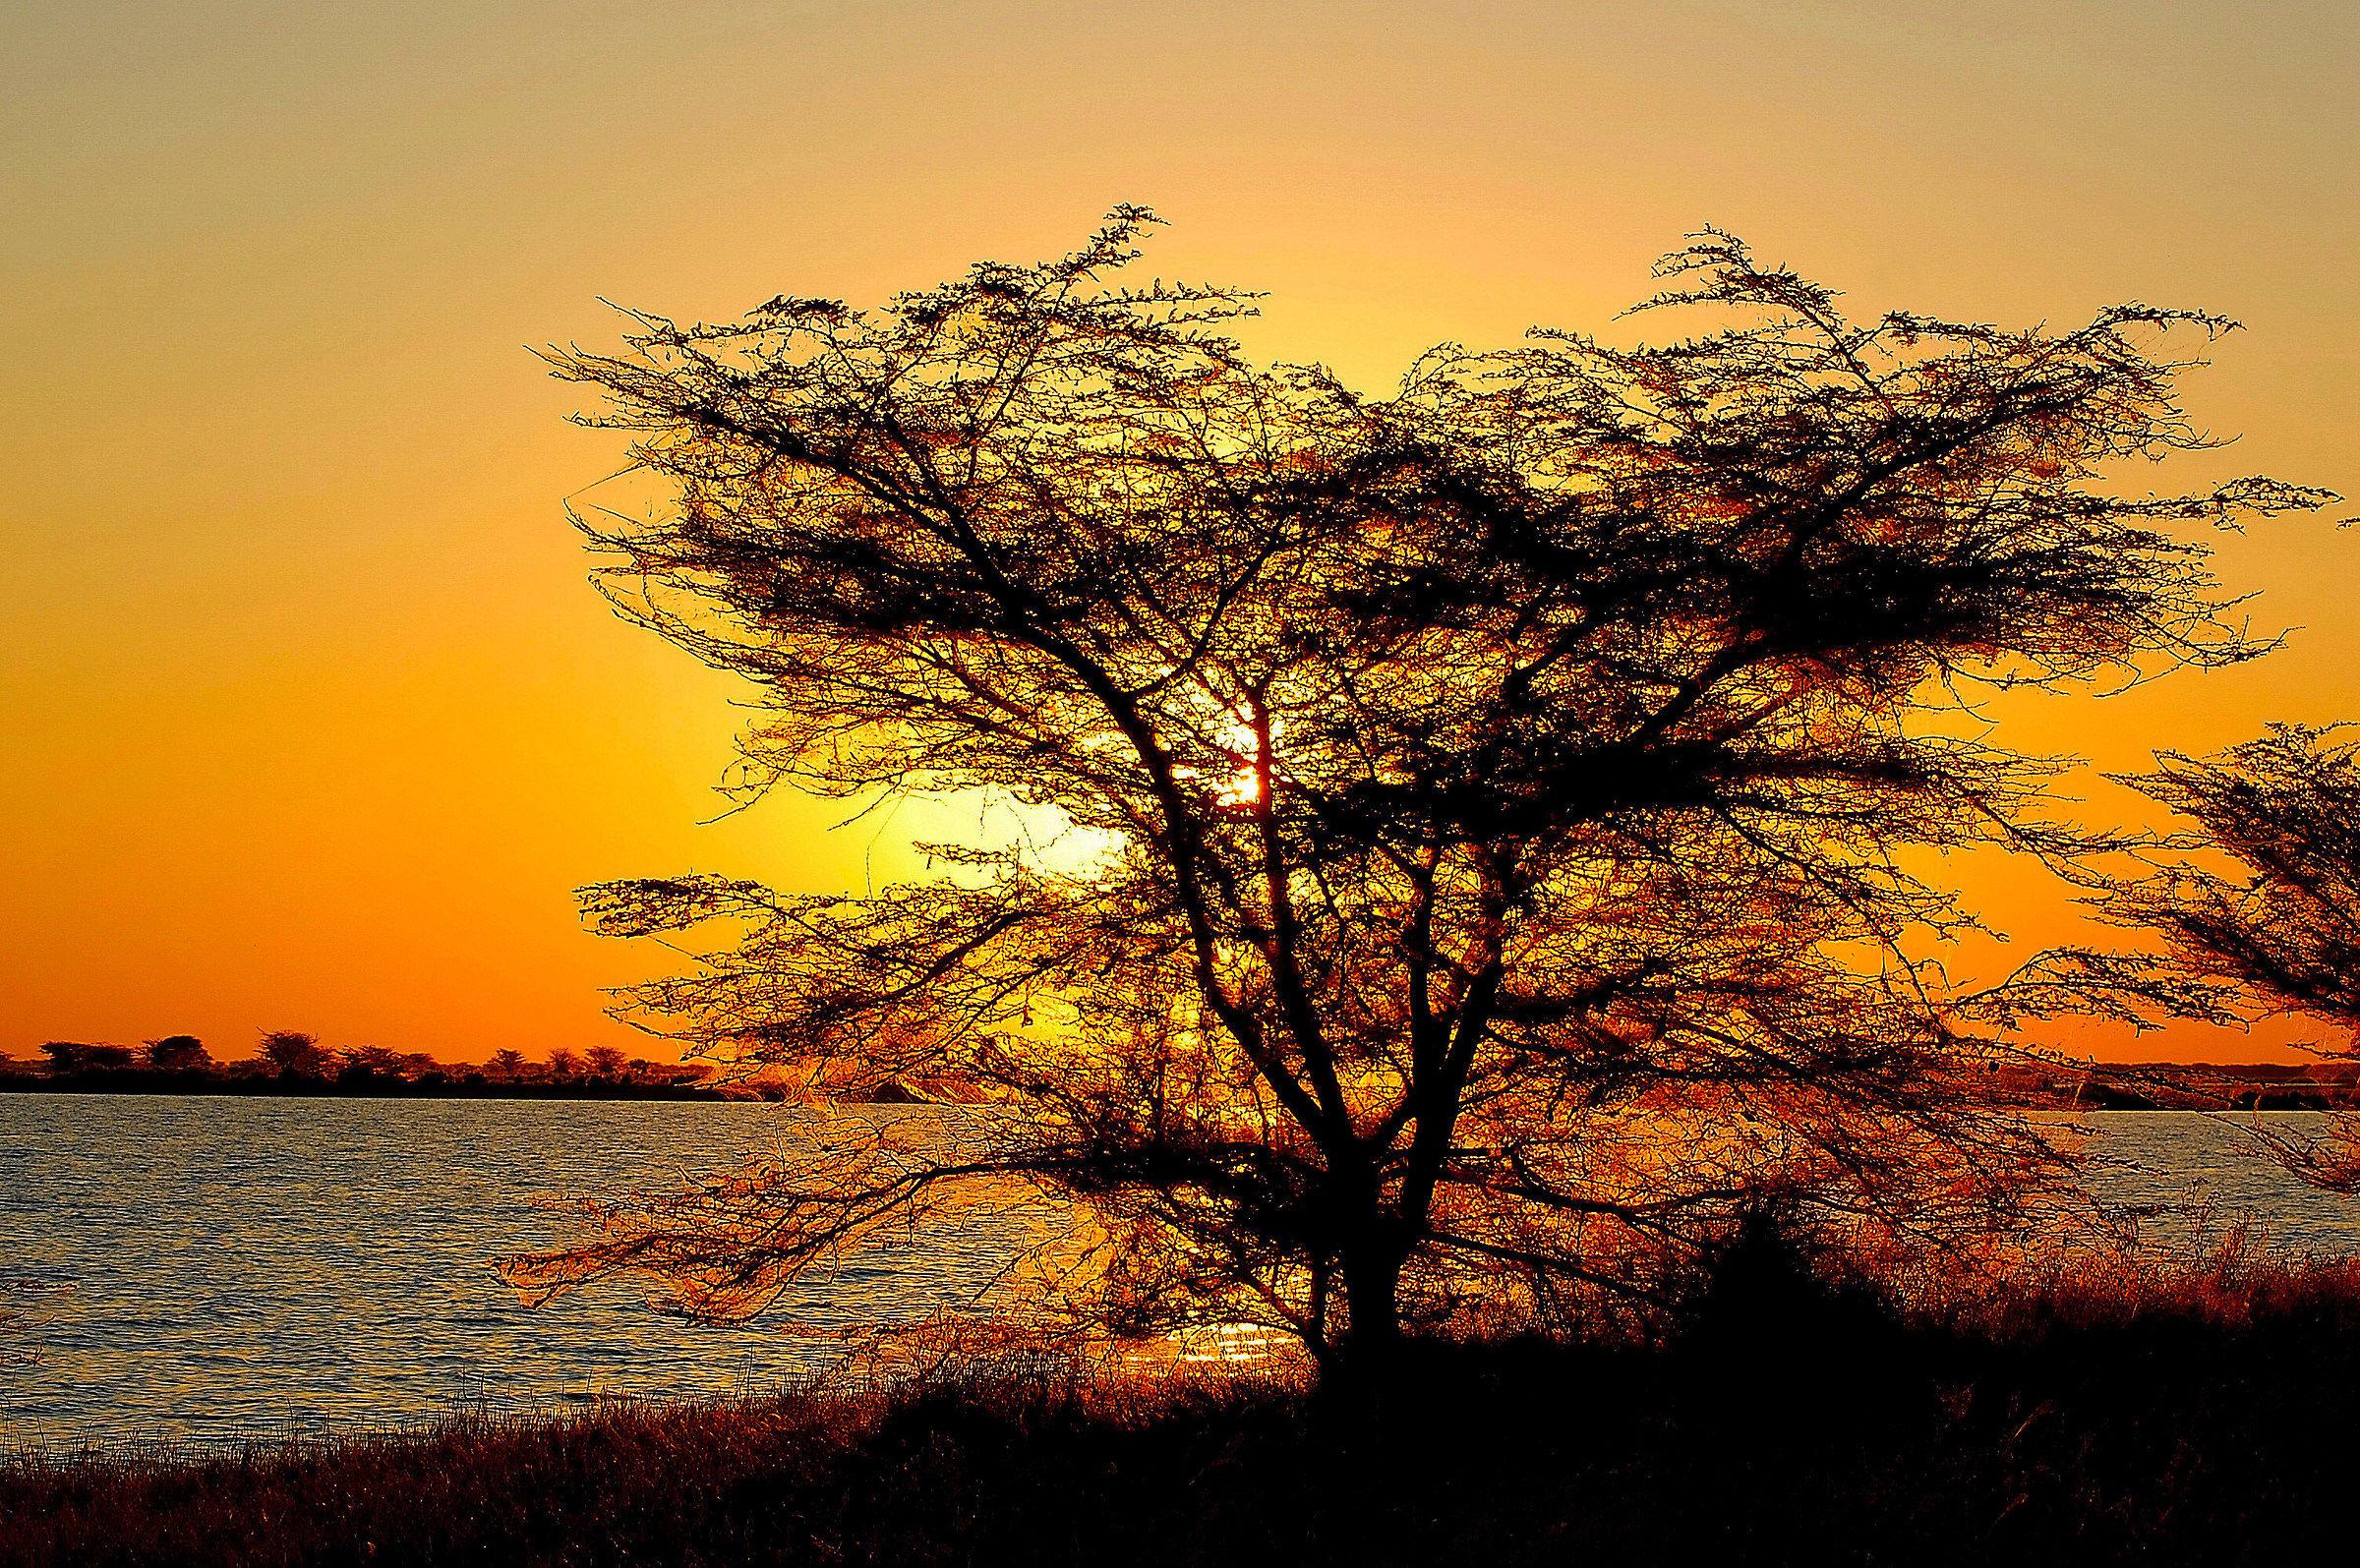 Botswana-Makgadikgadi Pans: Sunset on the Salt Lake...